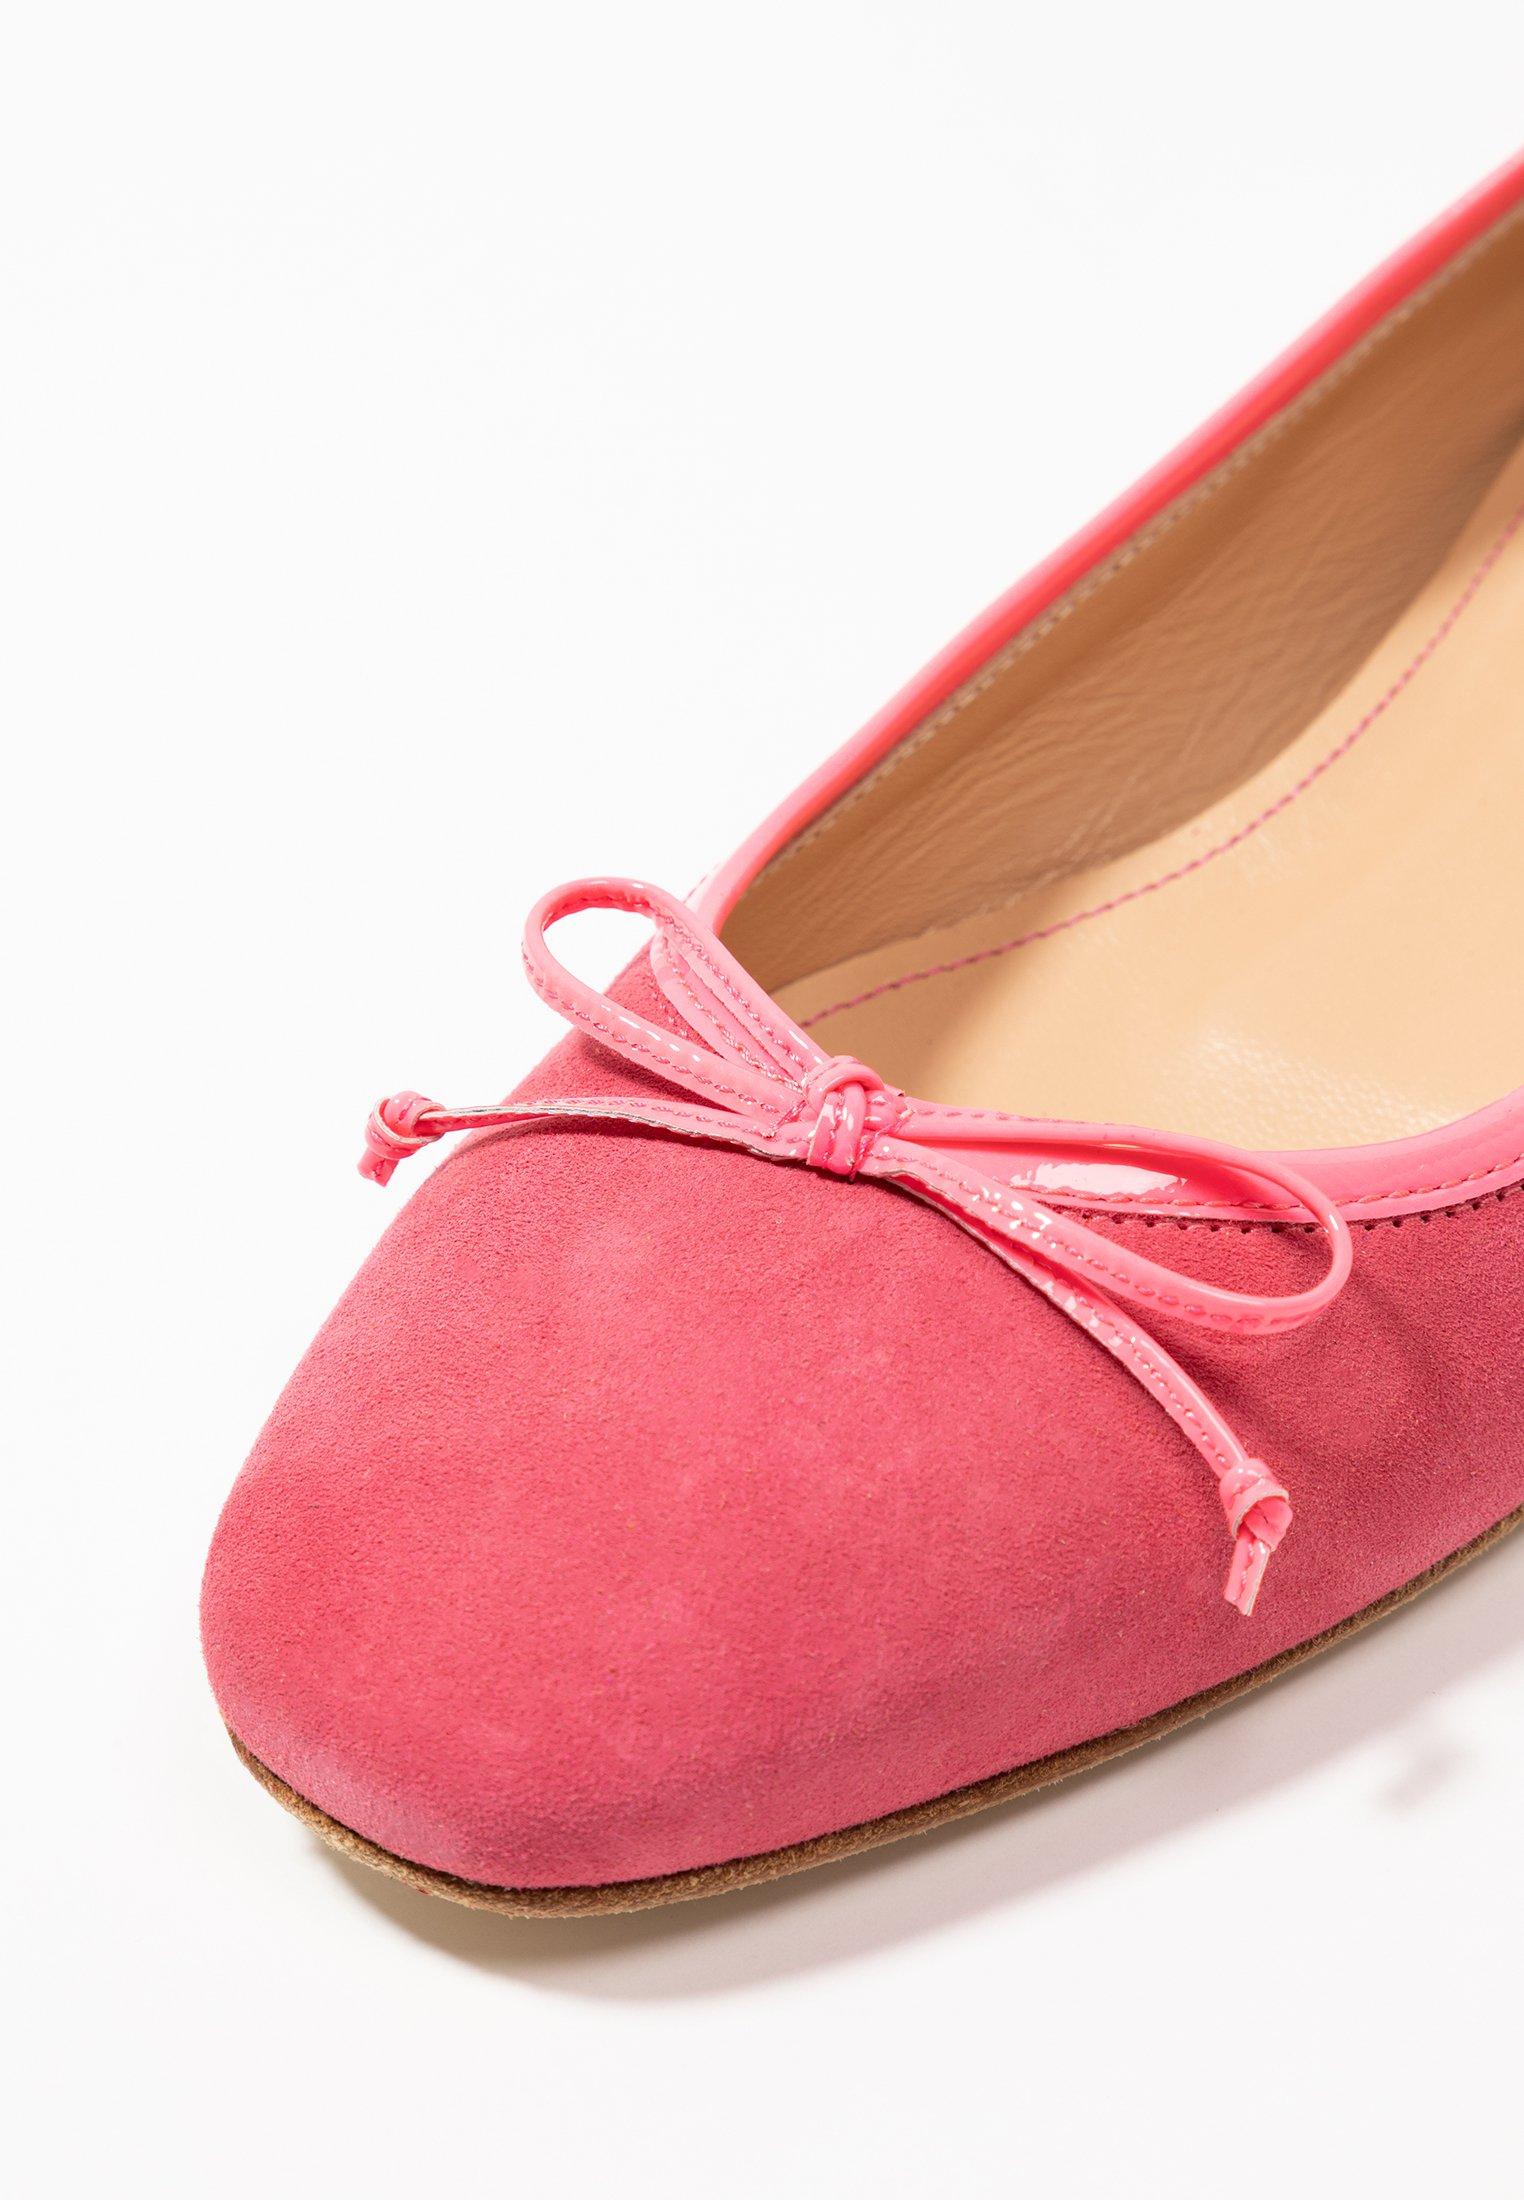 paolifirenze Ballerina - mauve/bordo